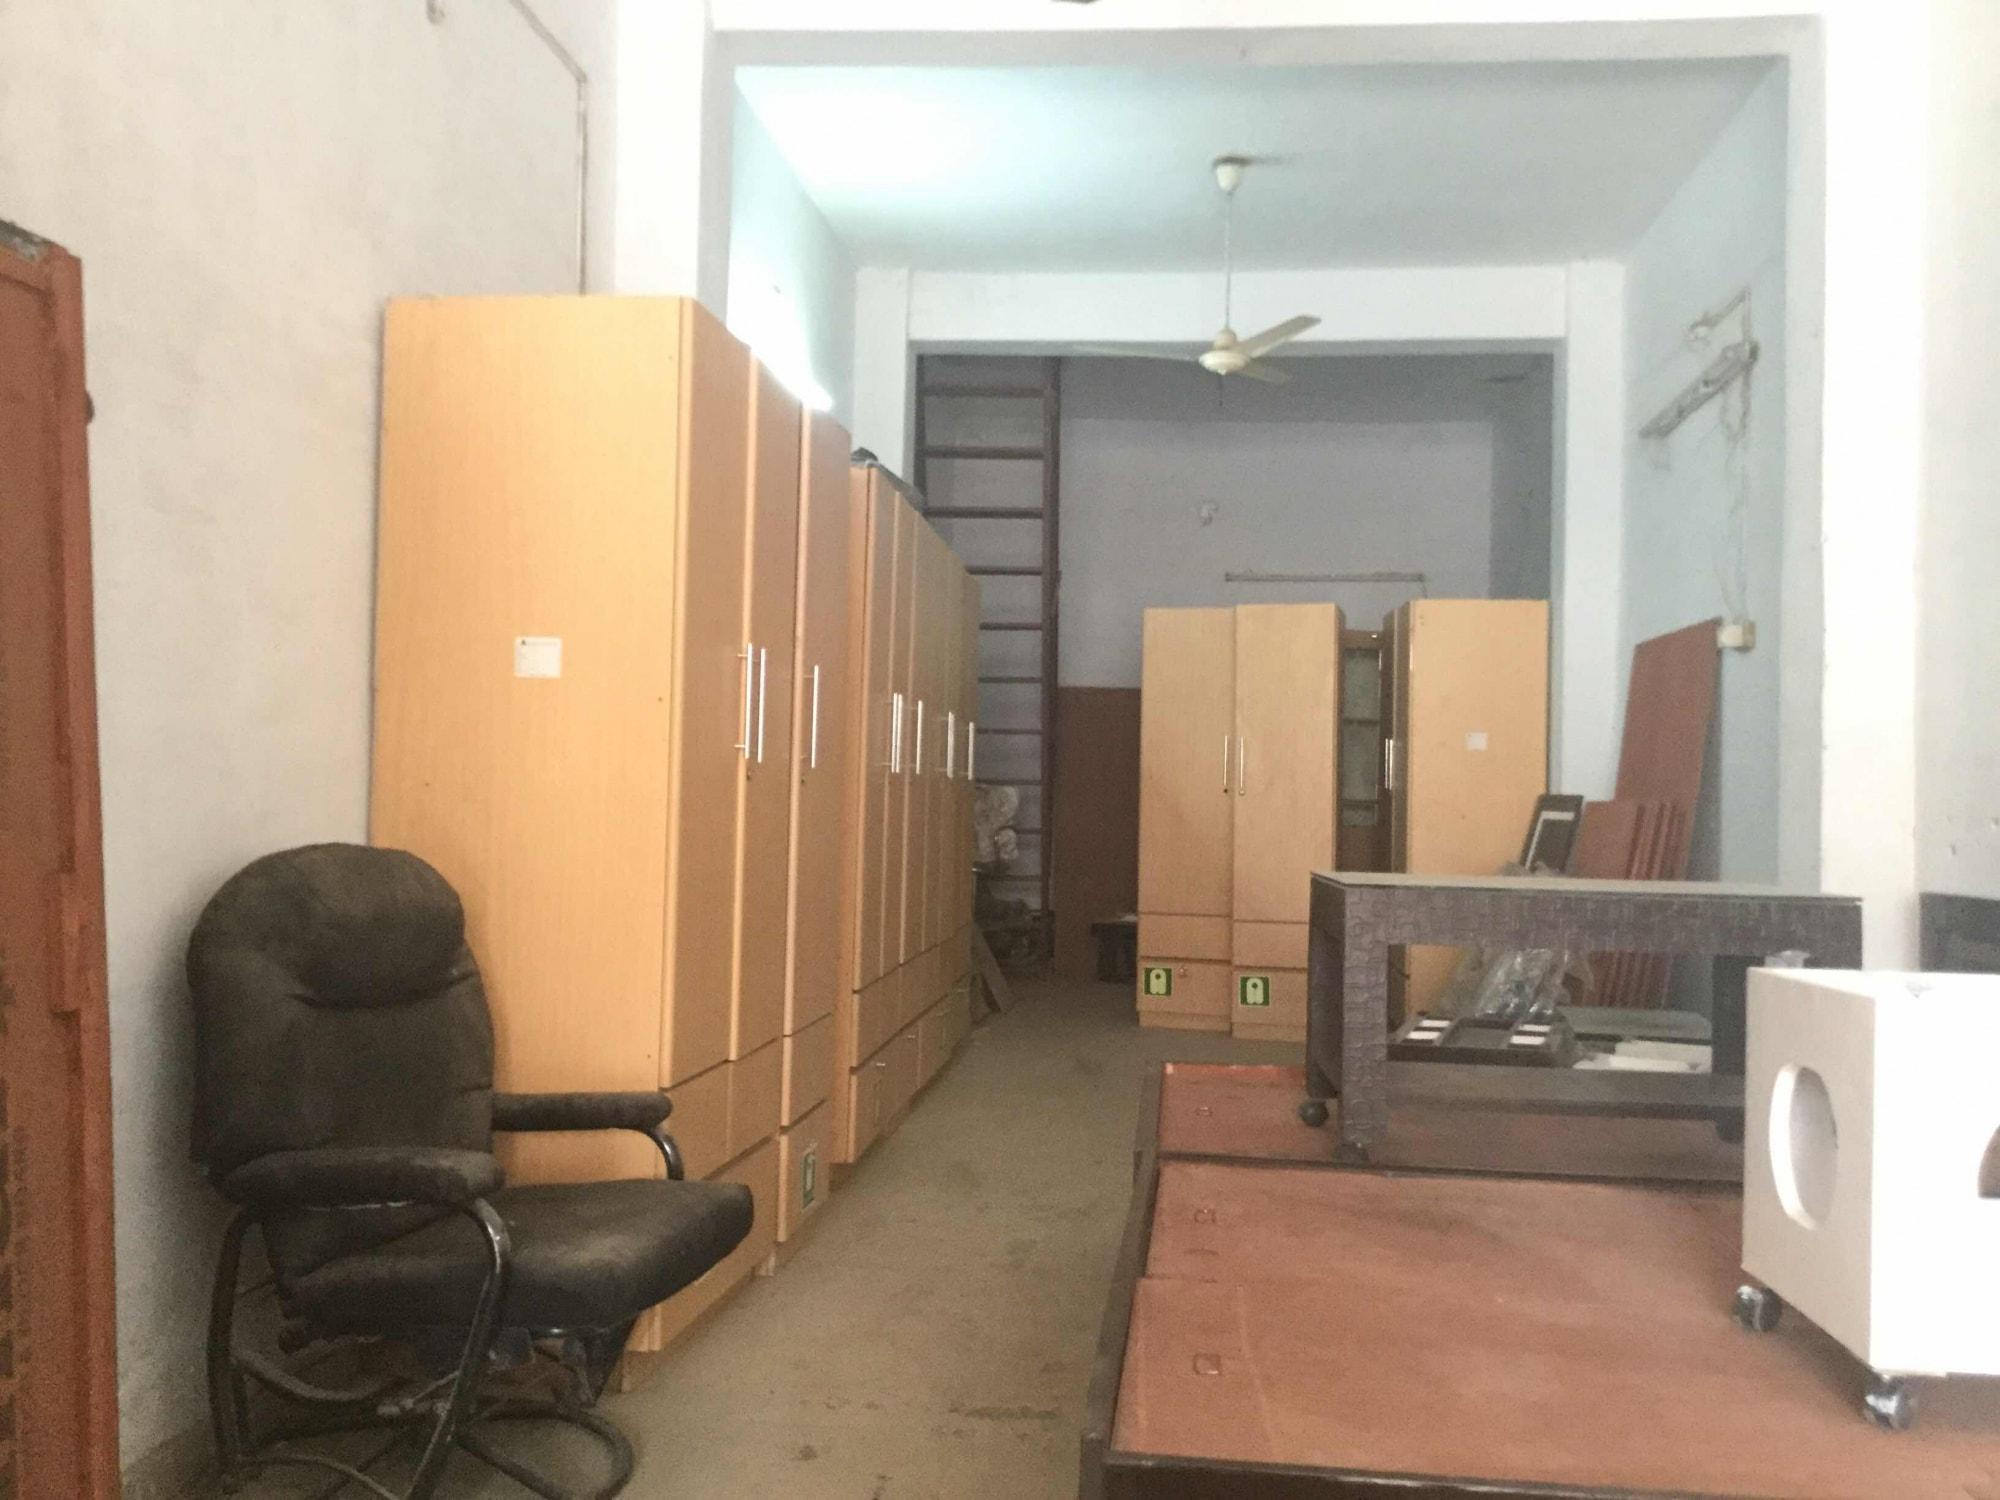 Superb ... Inside View Of Shop   Swagat Alang Ship Furniture Photos, Jivraj Park,  Ahmedabad